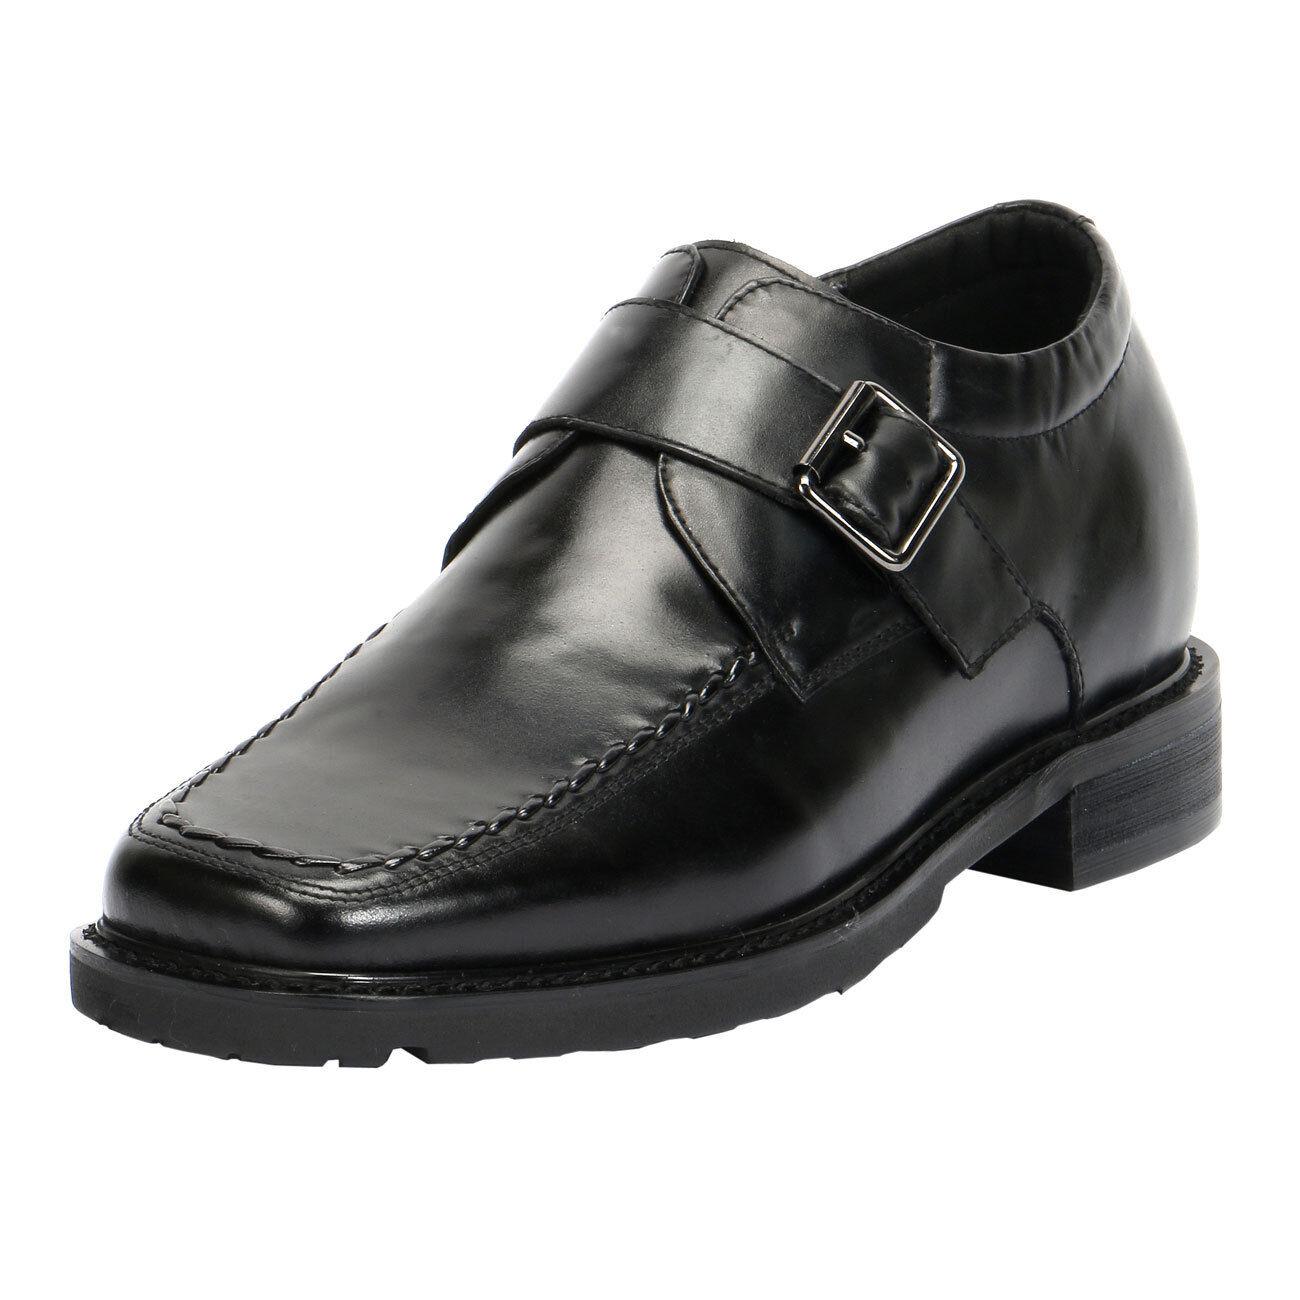 Comfort Men's Hidden High Heel Strap shoes 3  taller height JD023